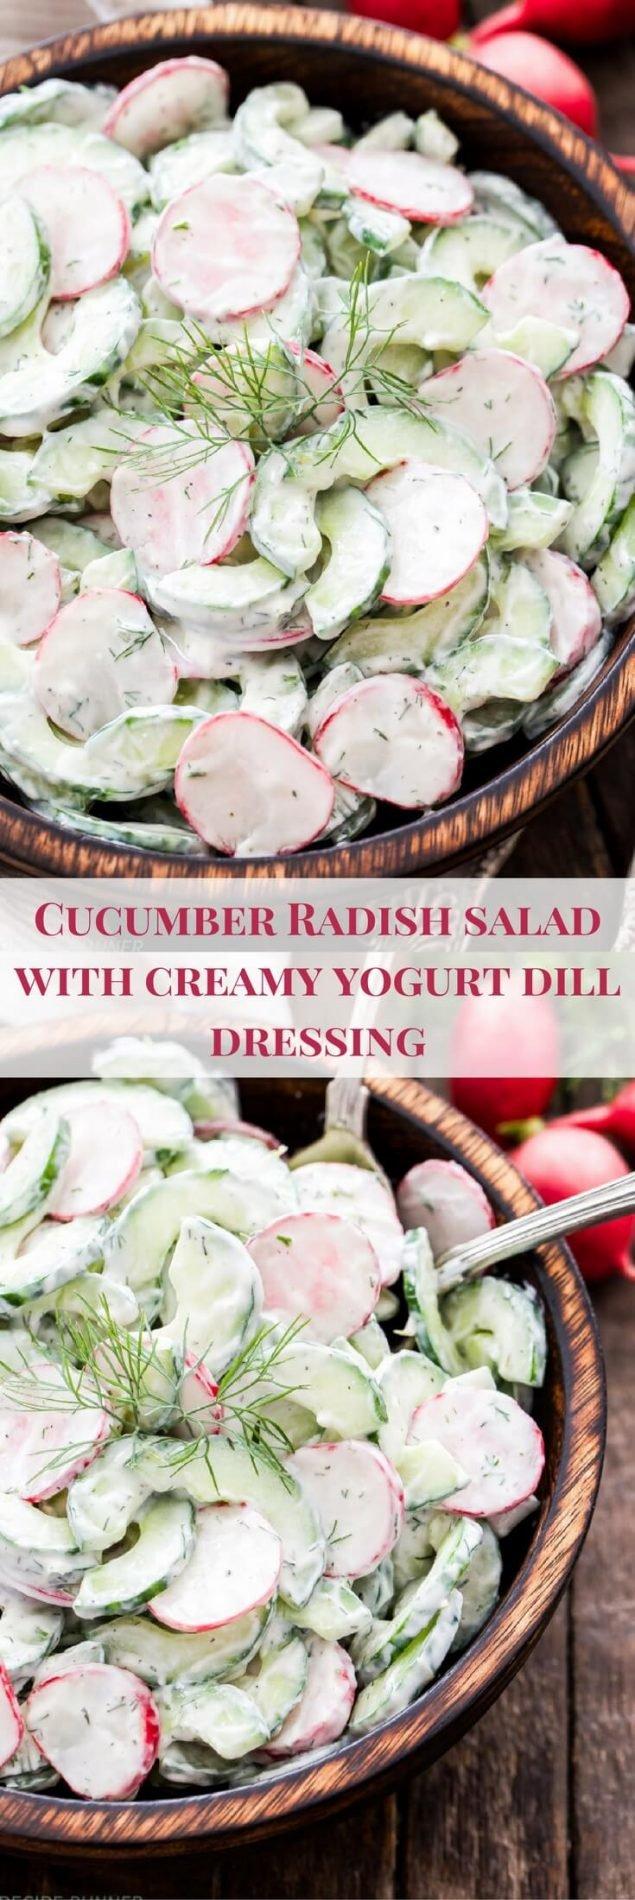 Cucumber Radish Salad with Creamy Yogurt Dill Dressing - Crisp and crunchy with a delicious creamy Greek yogurt dressing full of lemon juice and fresh dill. It's the perfect summer salad!